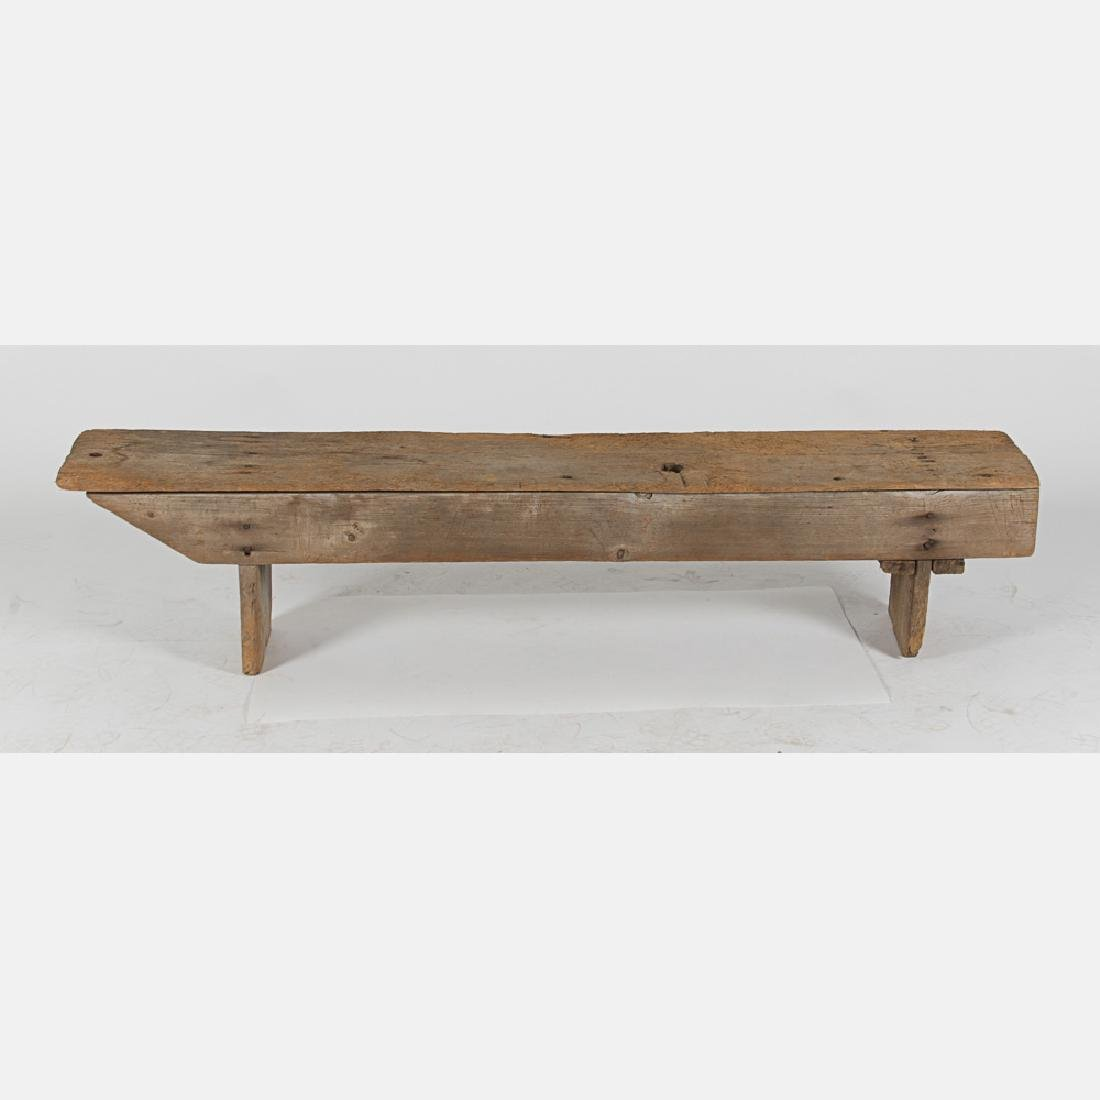 An American Rustic Pine Bench, 19th Century. - 2